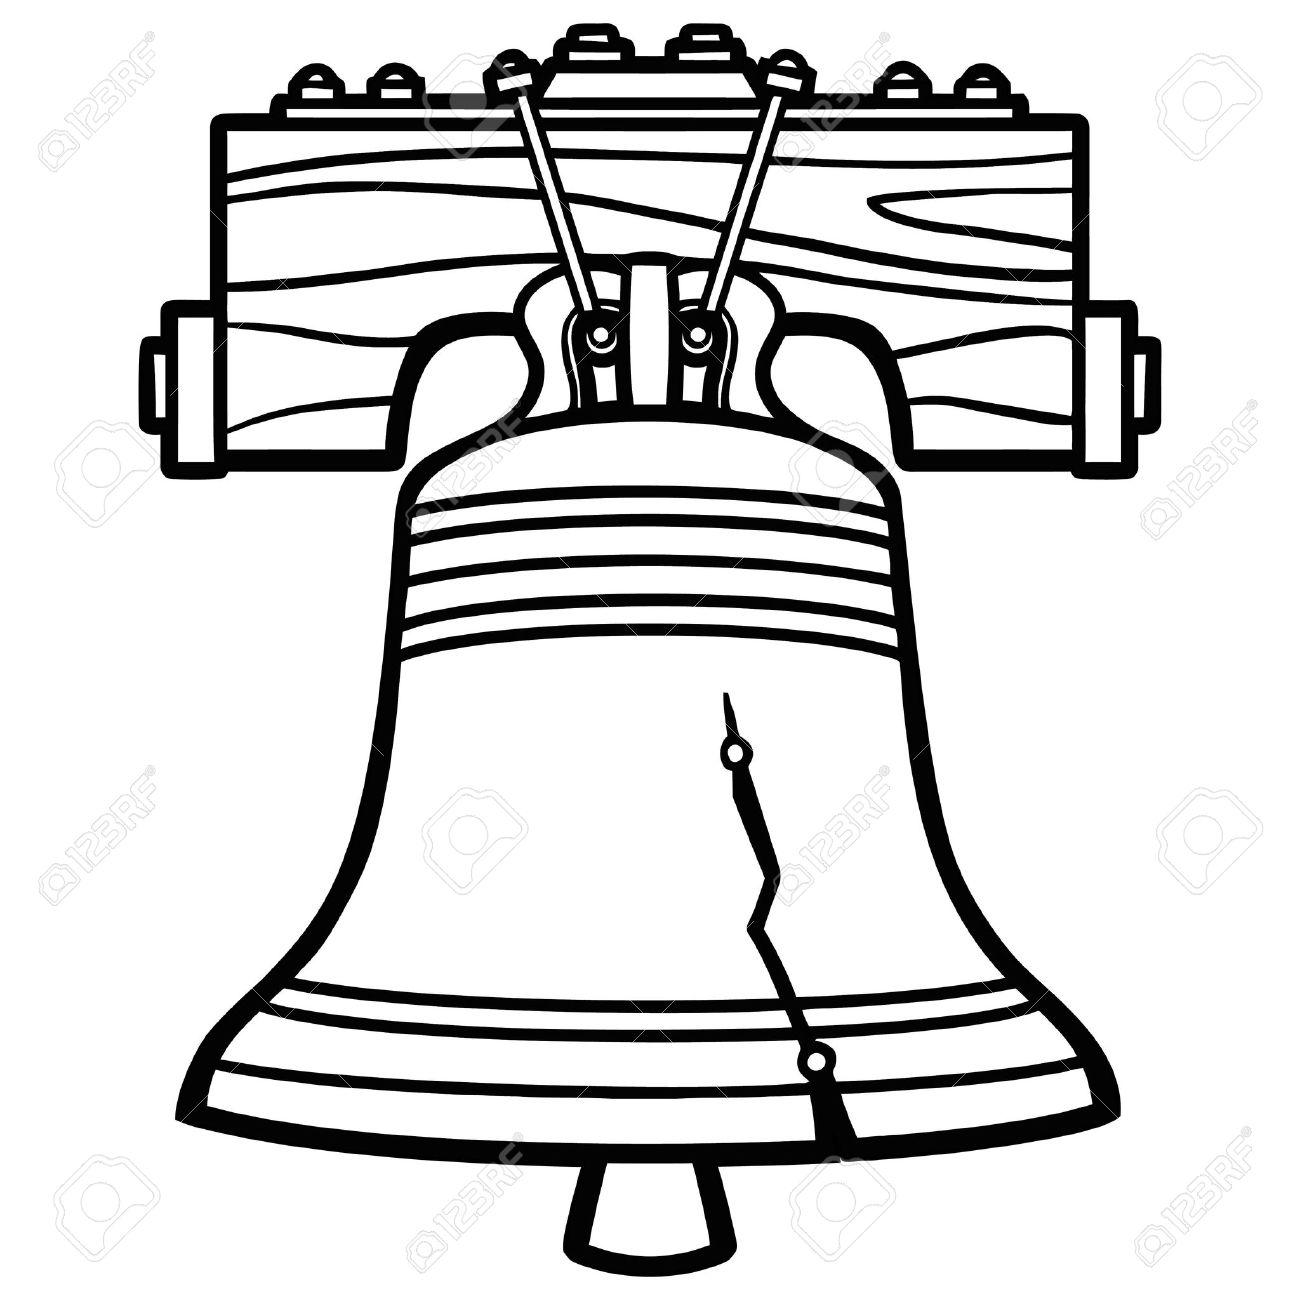 1300x1300 Liberty Bell Illustration Royalty Free Cliparts, Vectors,